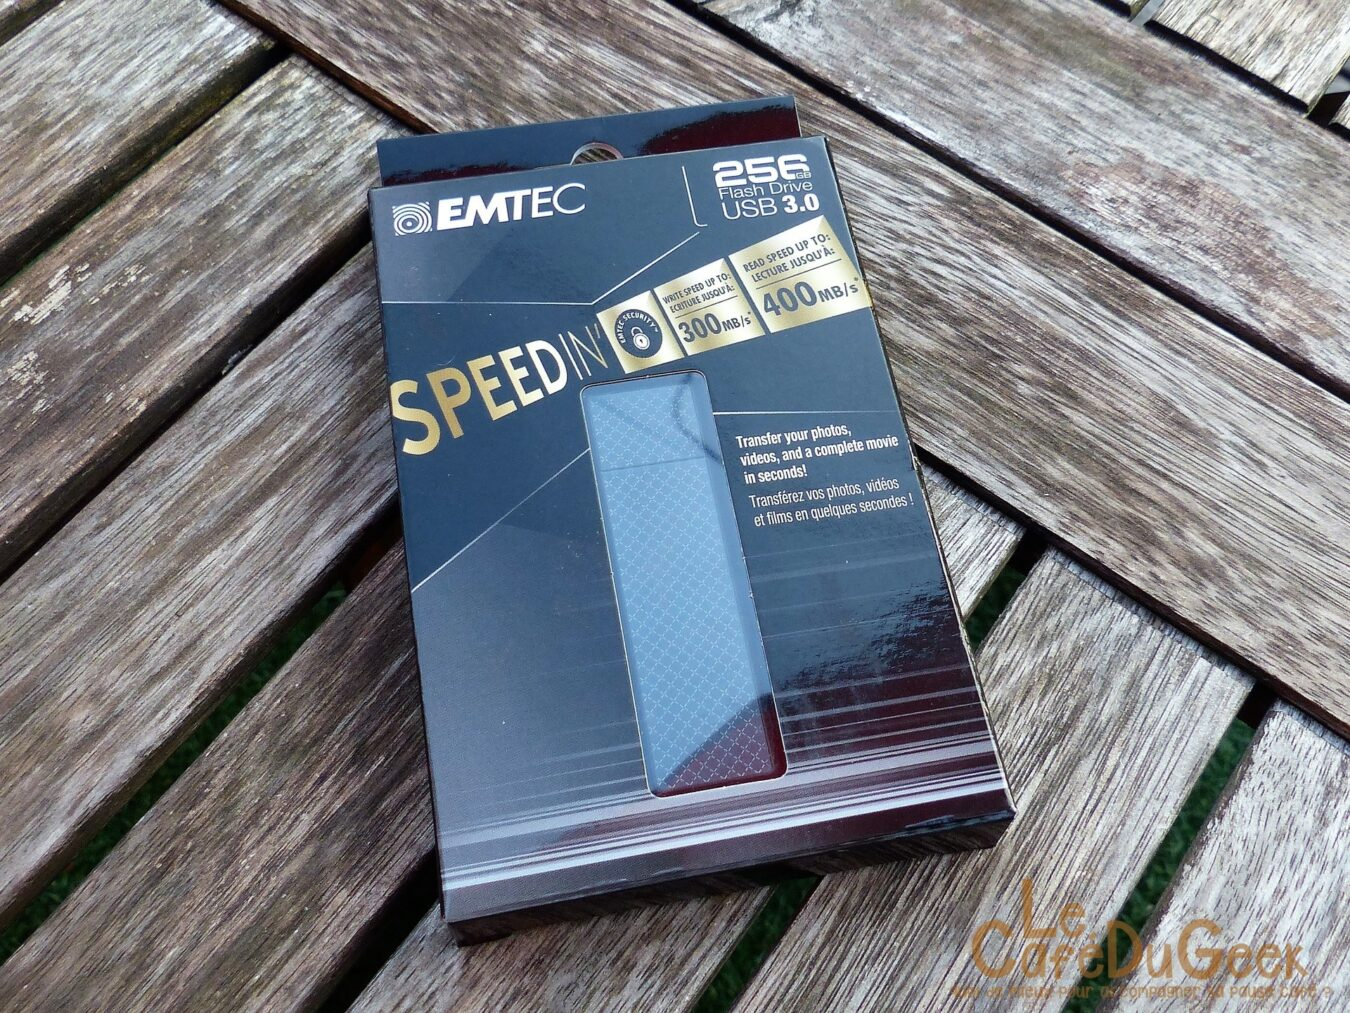 Photo of [TEST] SpeedIN' S600 de Emtec, Super Grosse Clé USB 3.0